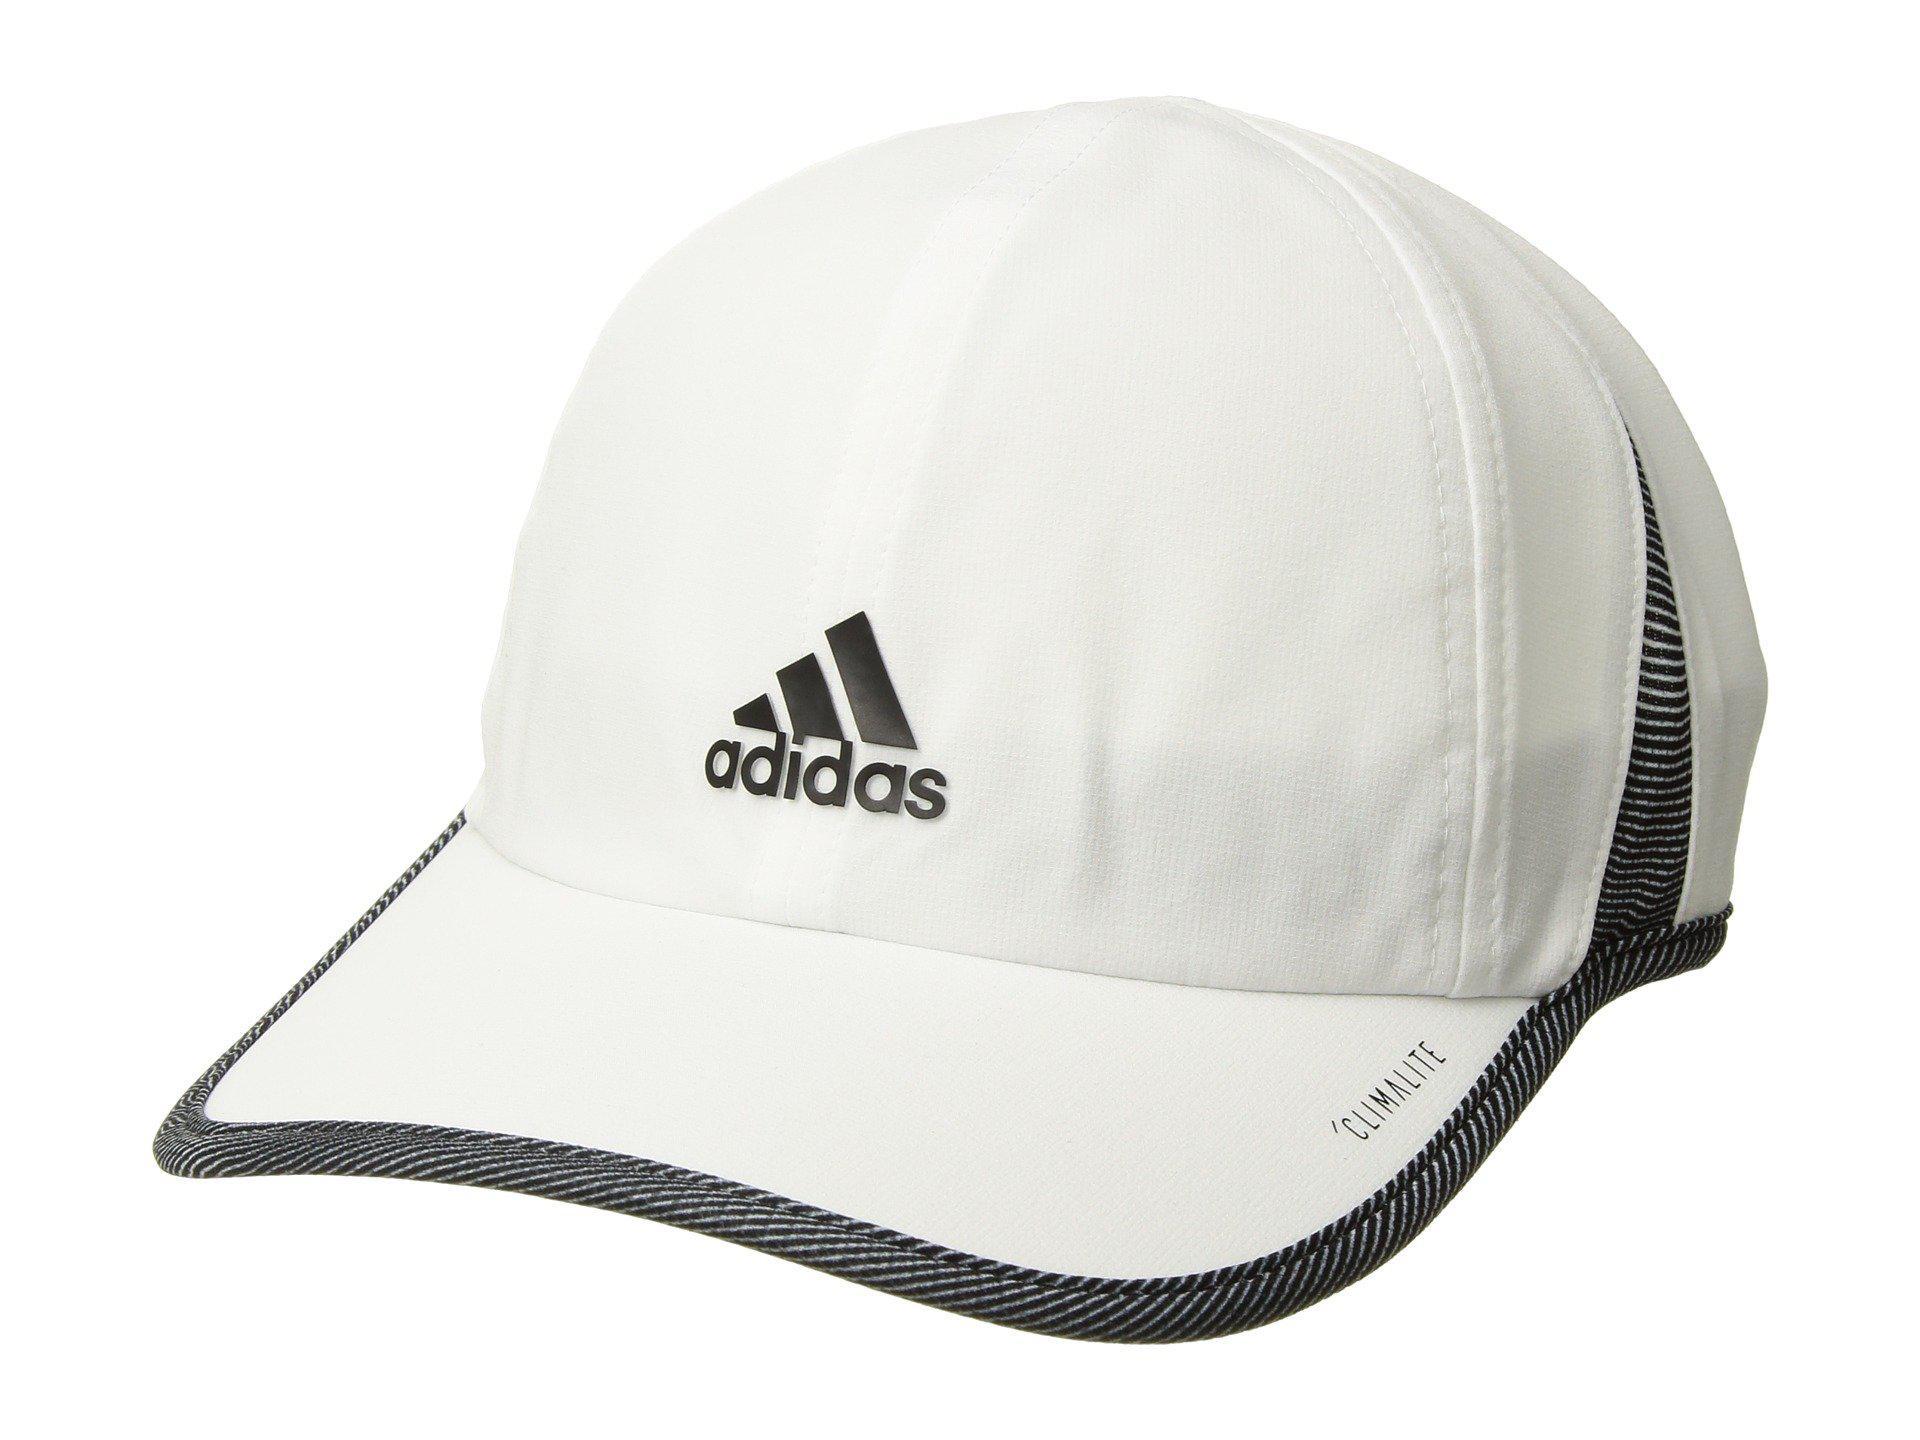 b3f0d6927aa Lyst - Adidas Superlite Cap (light Onix light Grey Heather clear ...